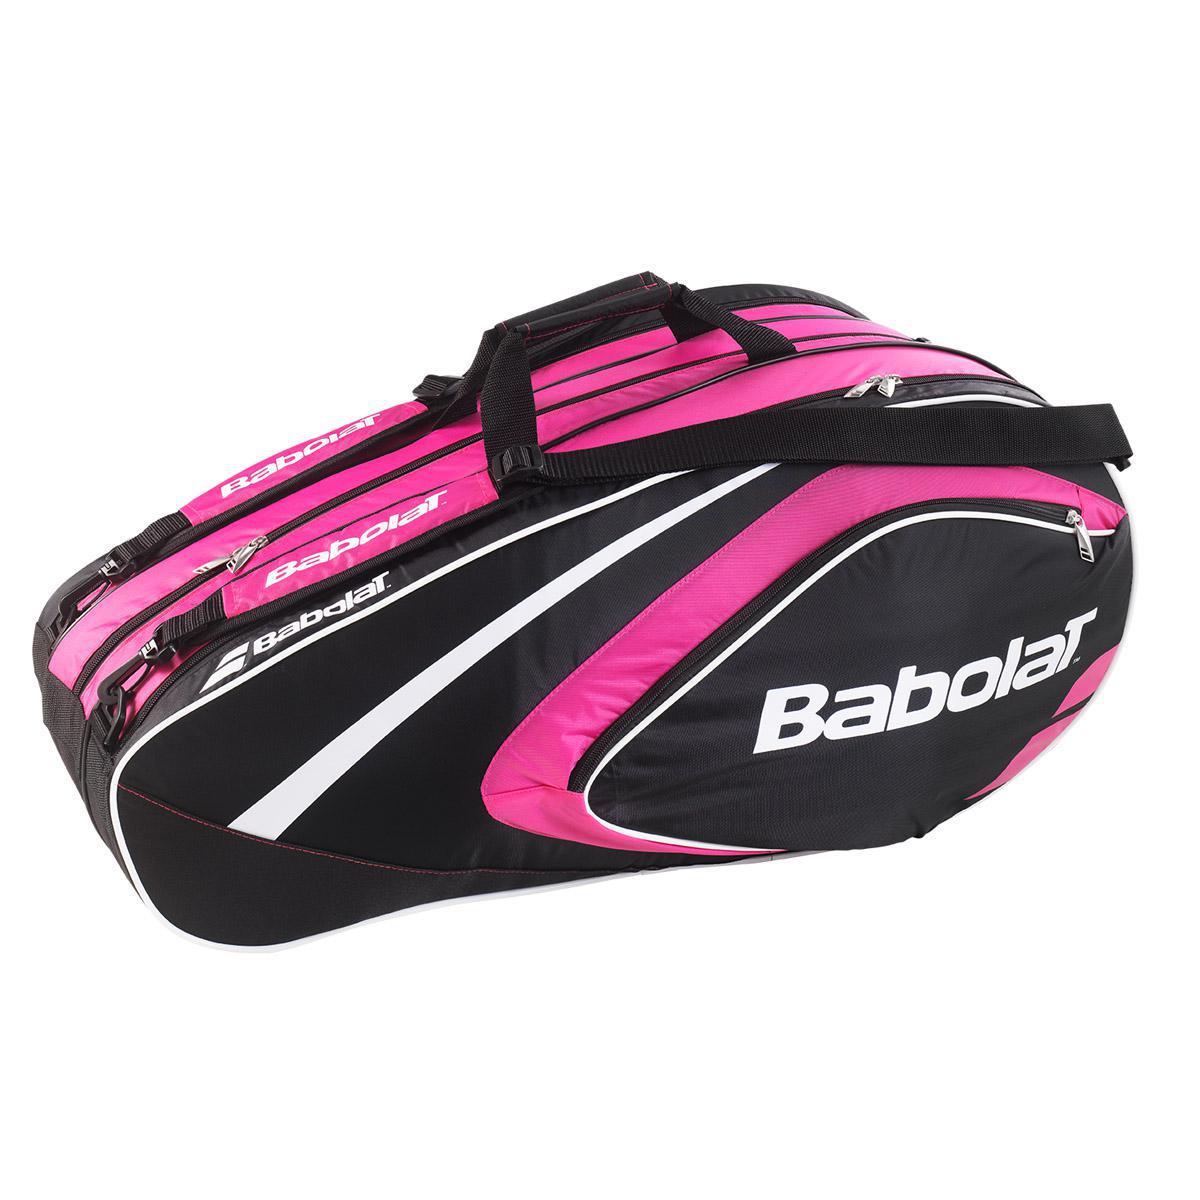 Babolat Club Line 12 Racket Bag - Pink - Tennisnuts.com